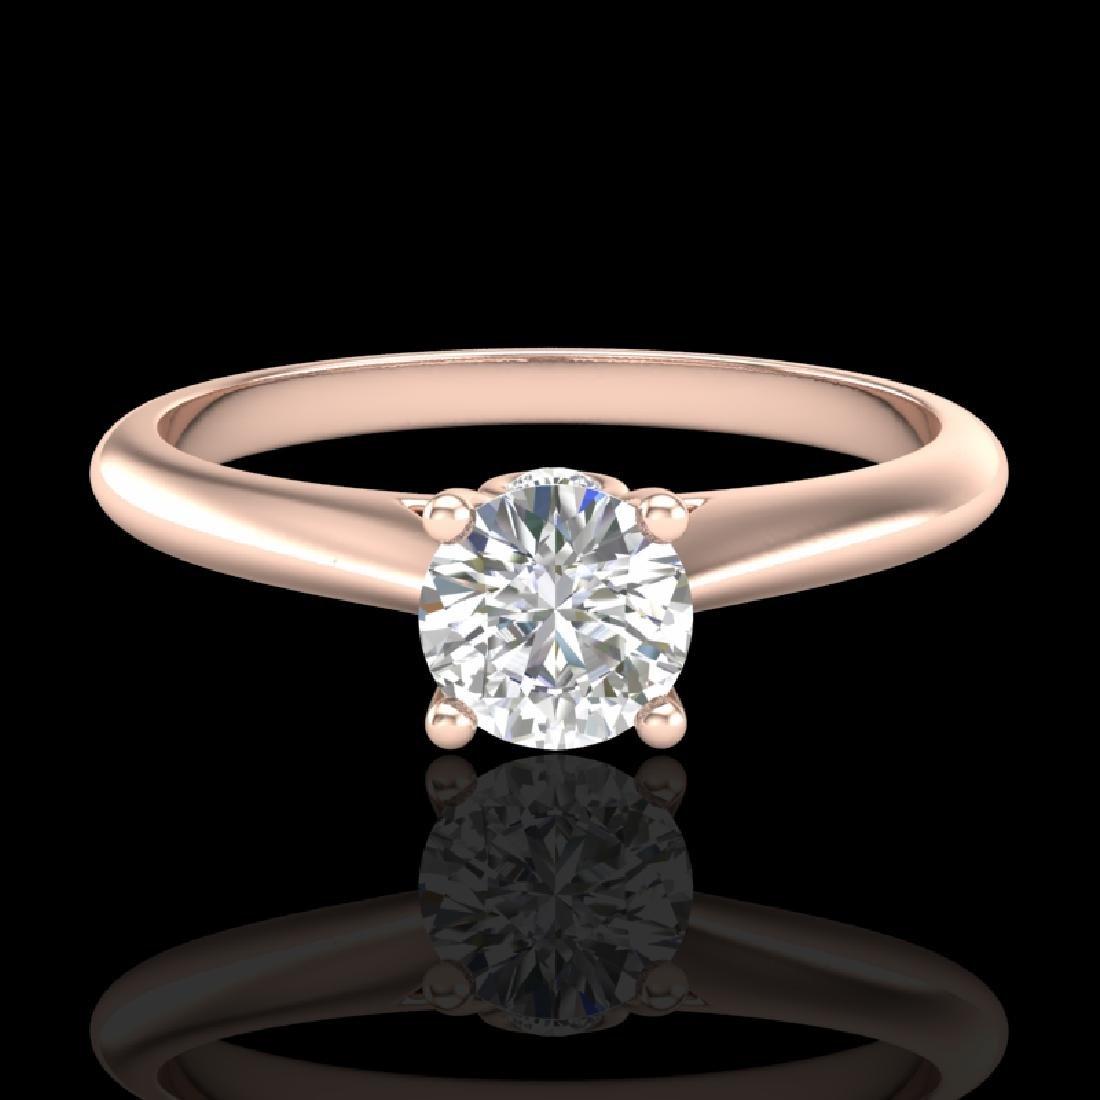 0.4 CTW VS/SI Diamond Solitaire Art Deco Ring 18K Rose - 2